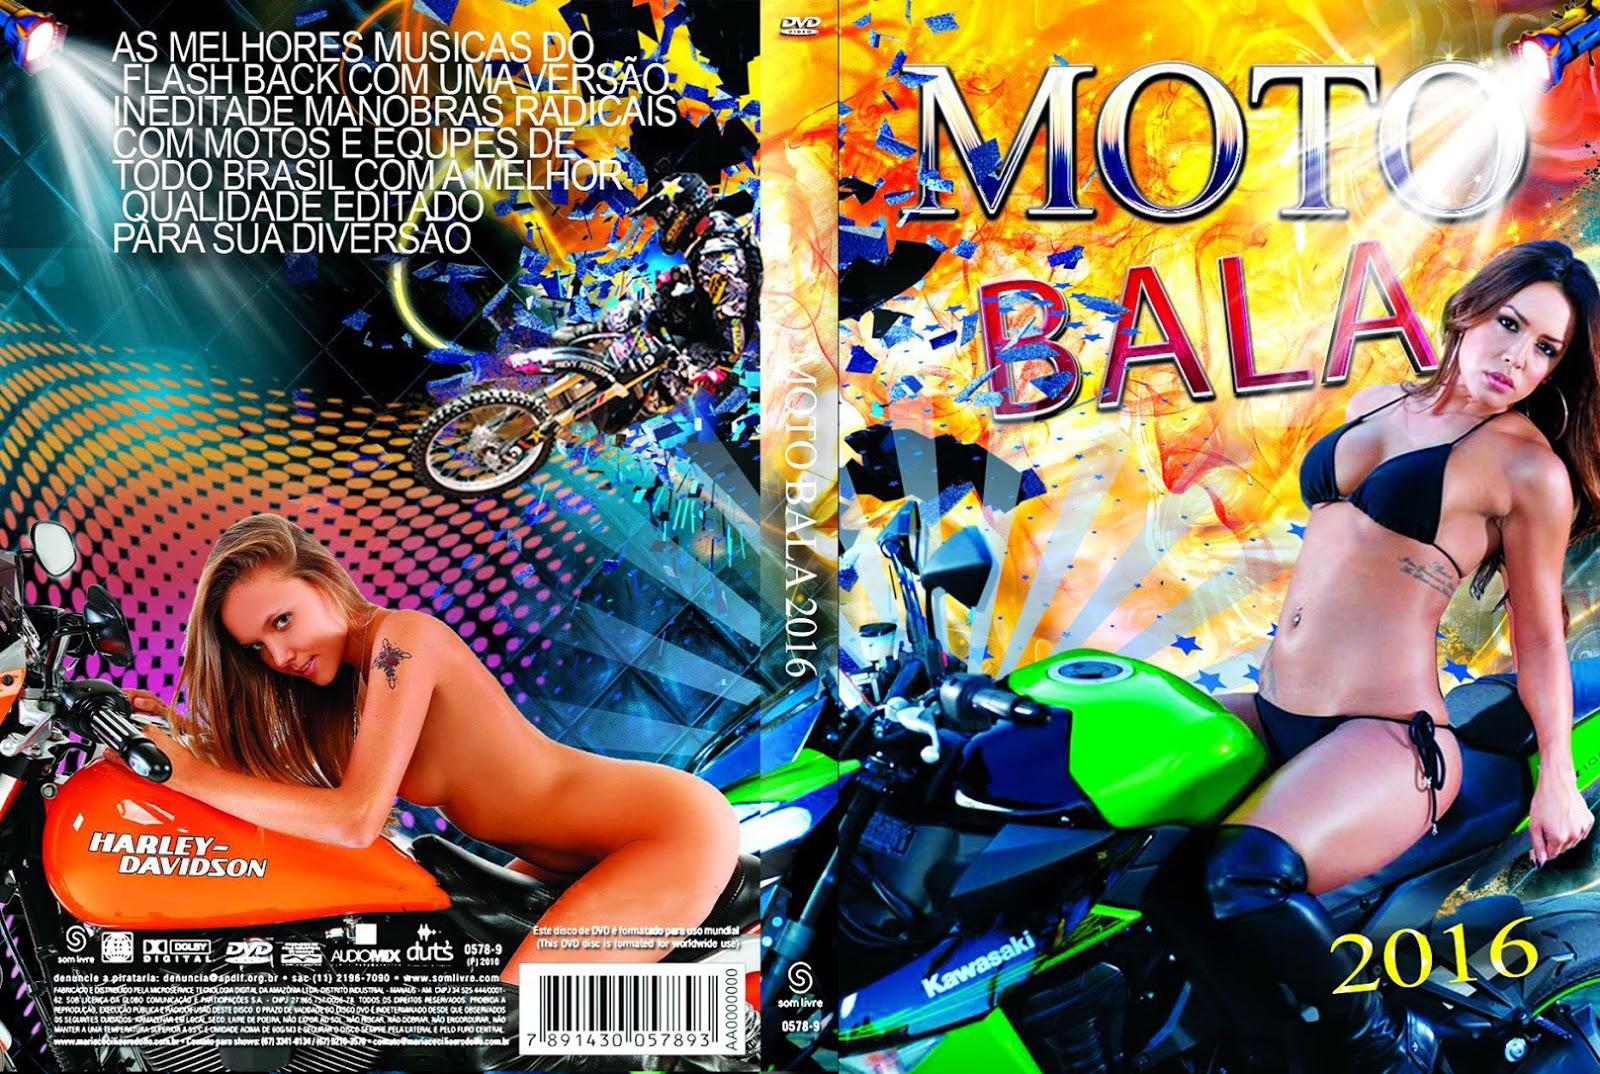 Moto Bala 2016 DVDRip + DVD-R Moto 2BBala 2B2016 2BDVD R 2B  2BXANDAO 2BDOWNLOAD